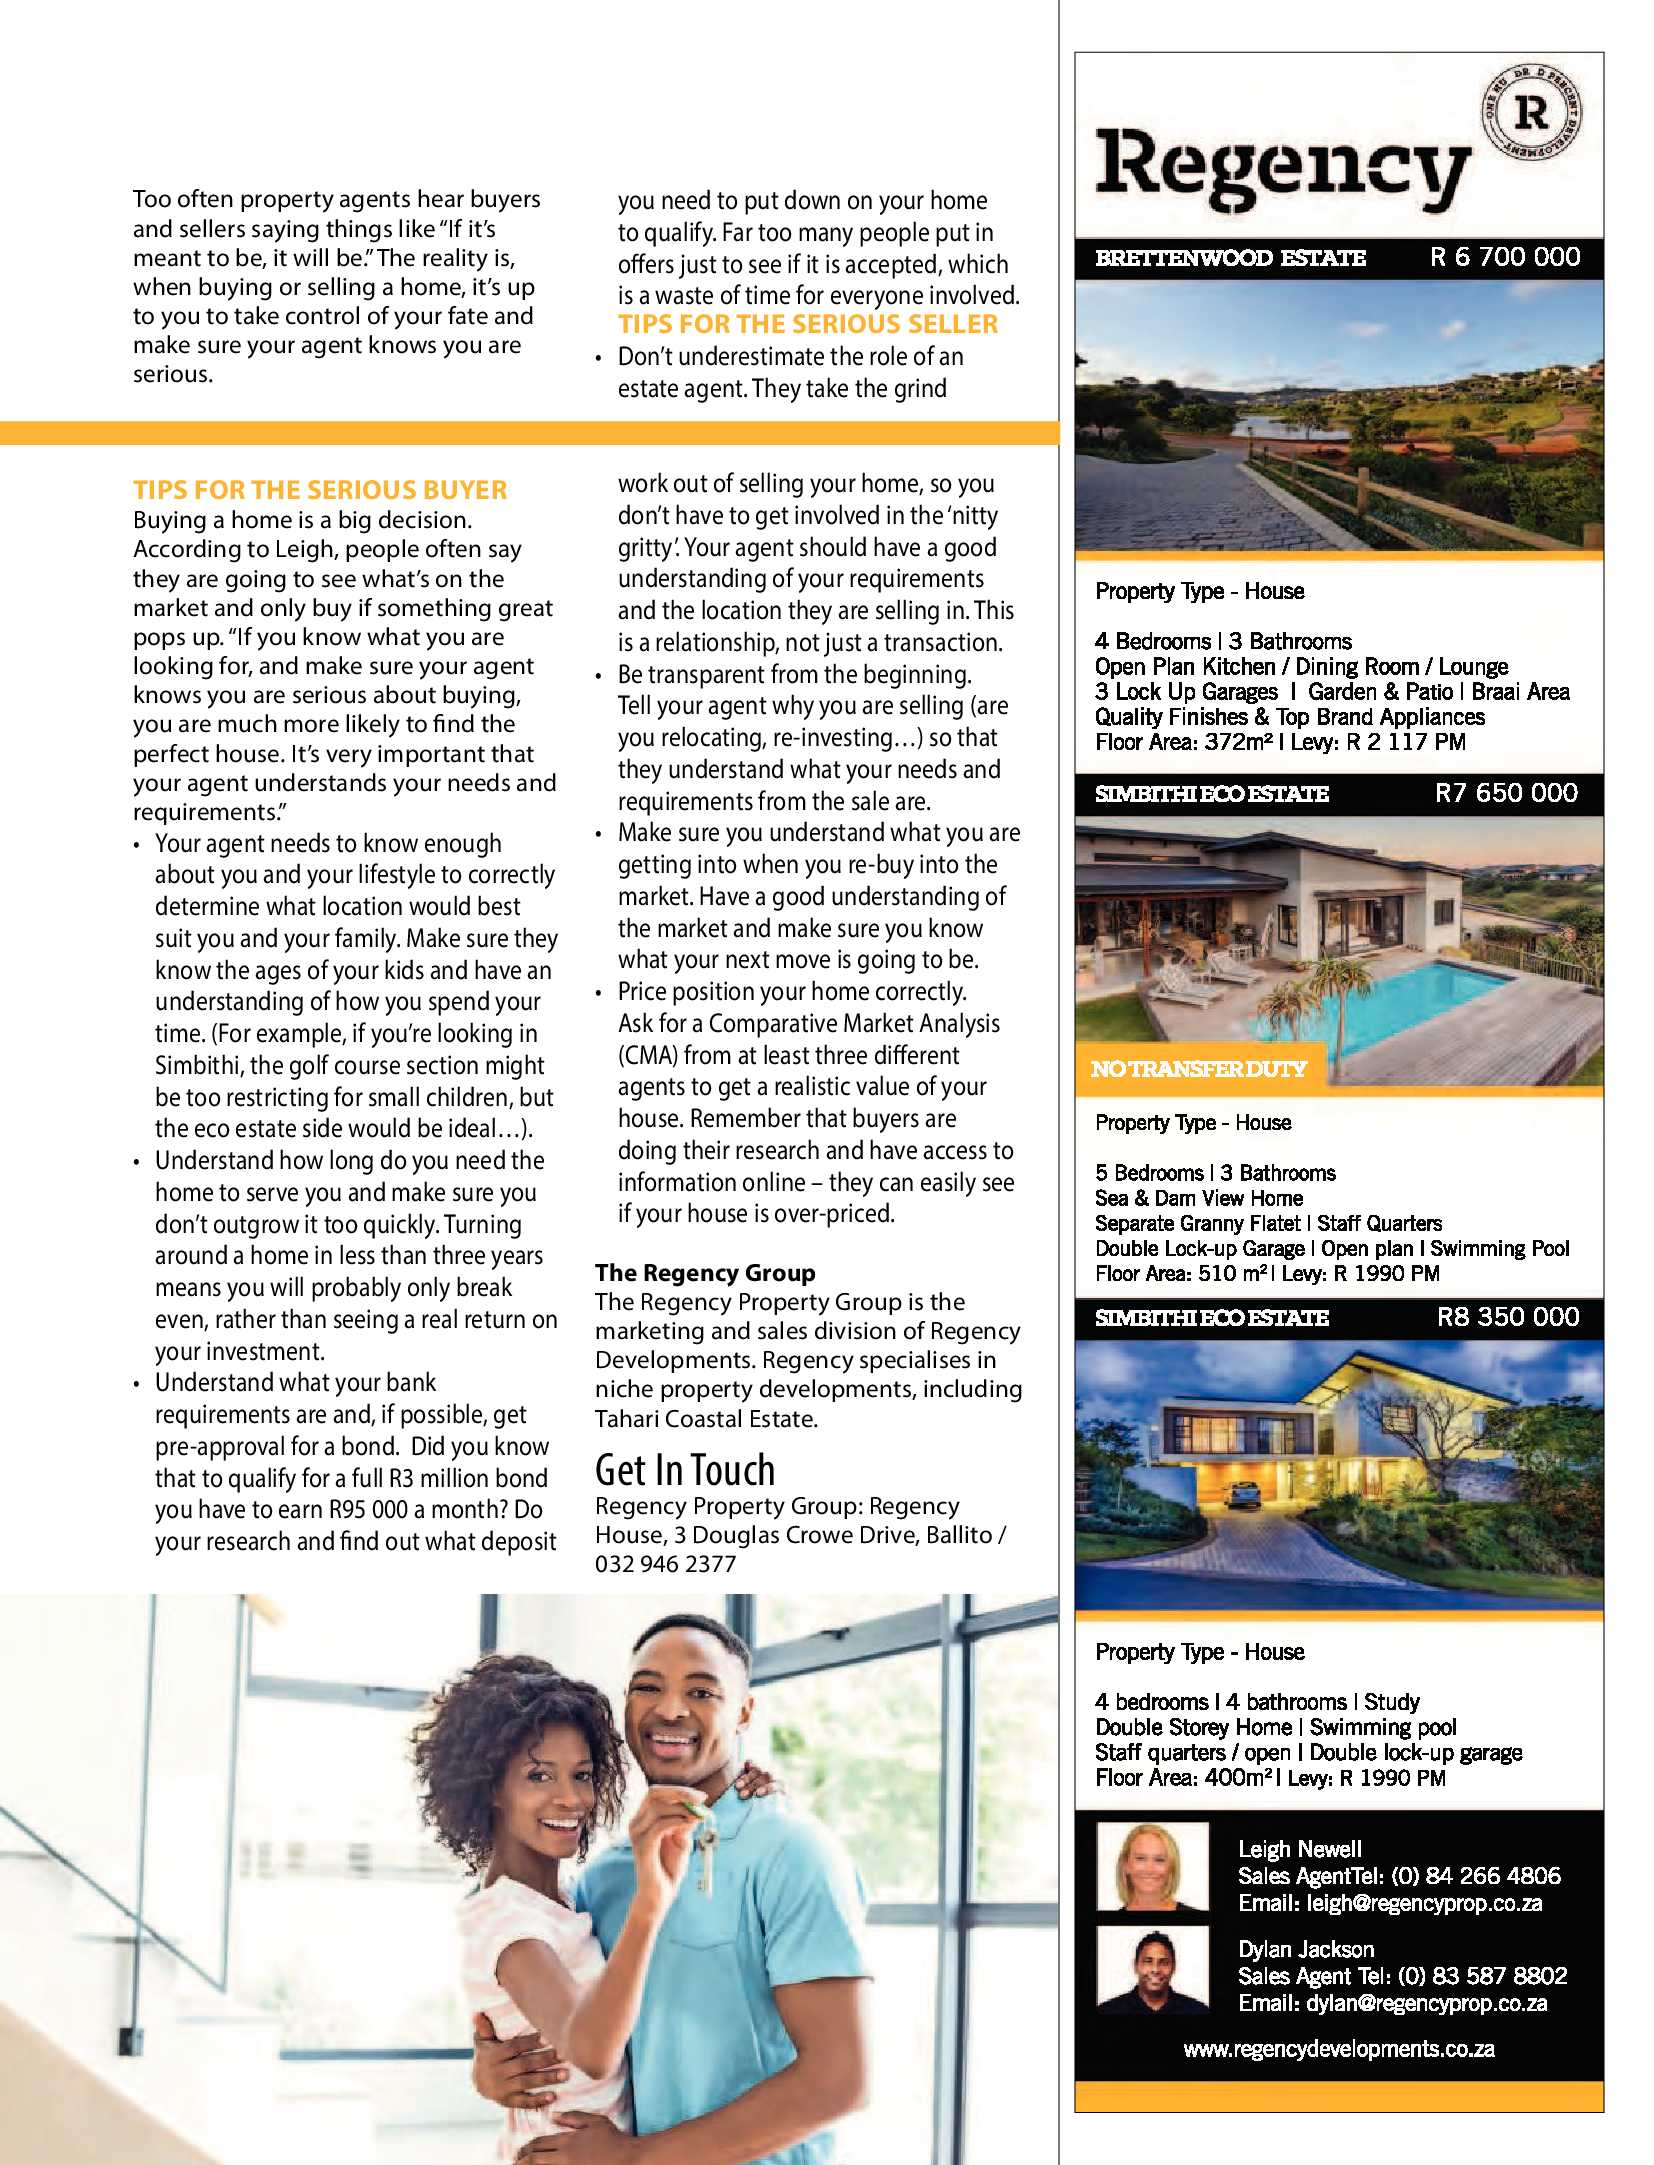 get-magazine-ballitoumhlanga-july-2017-2-epapers-page-45